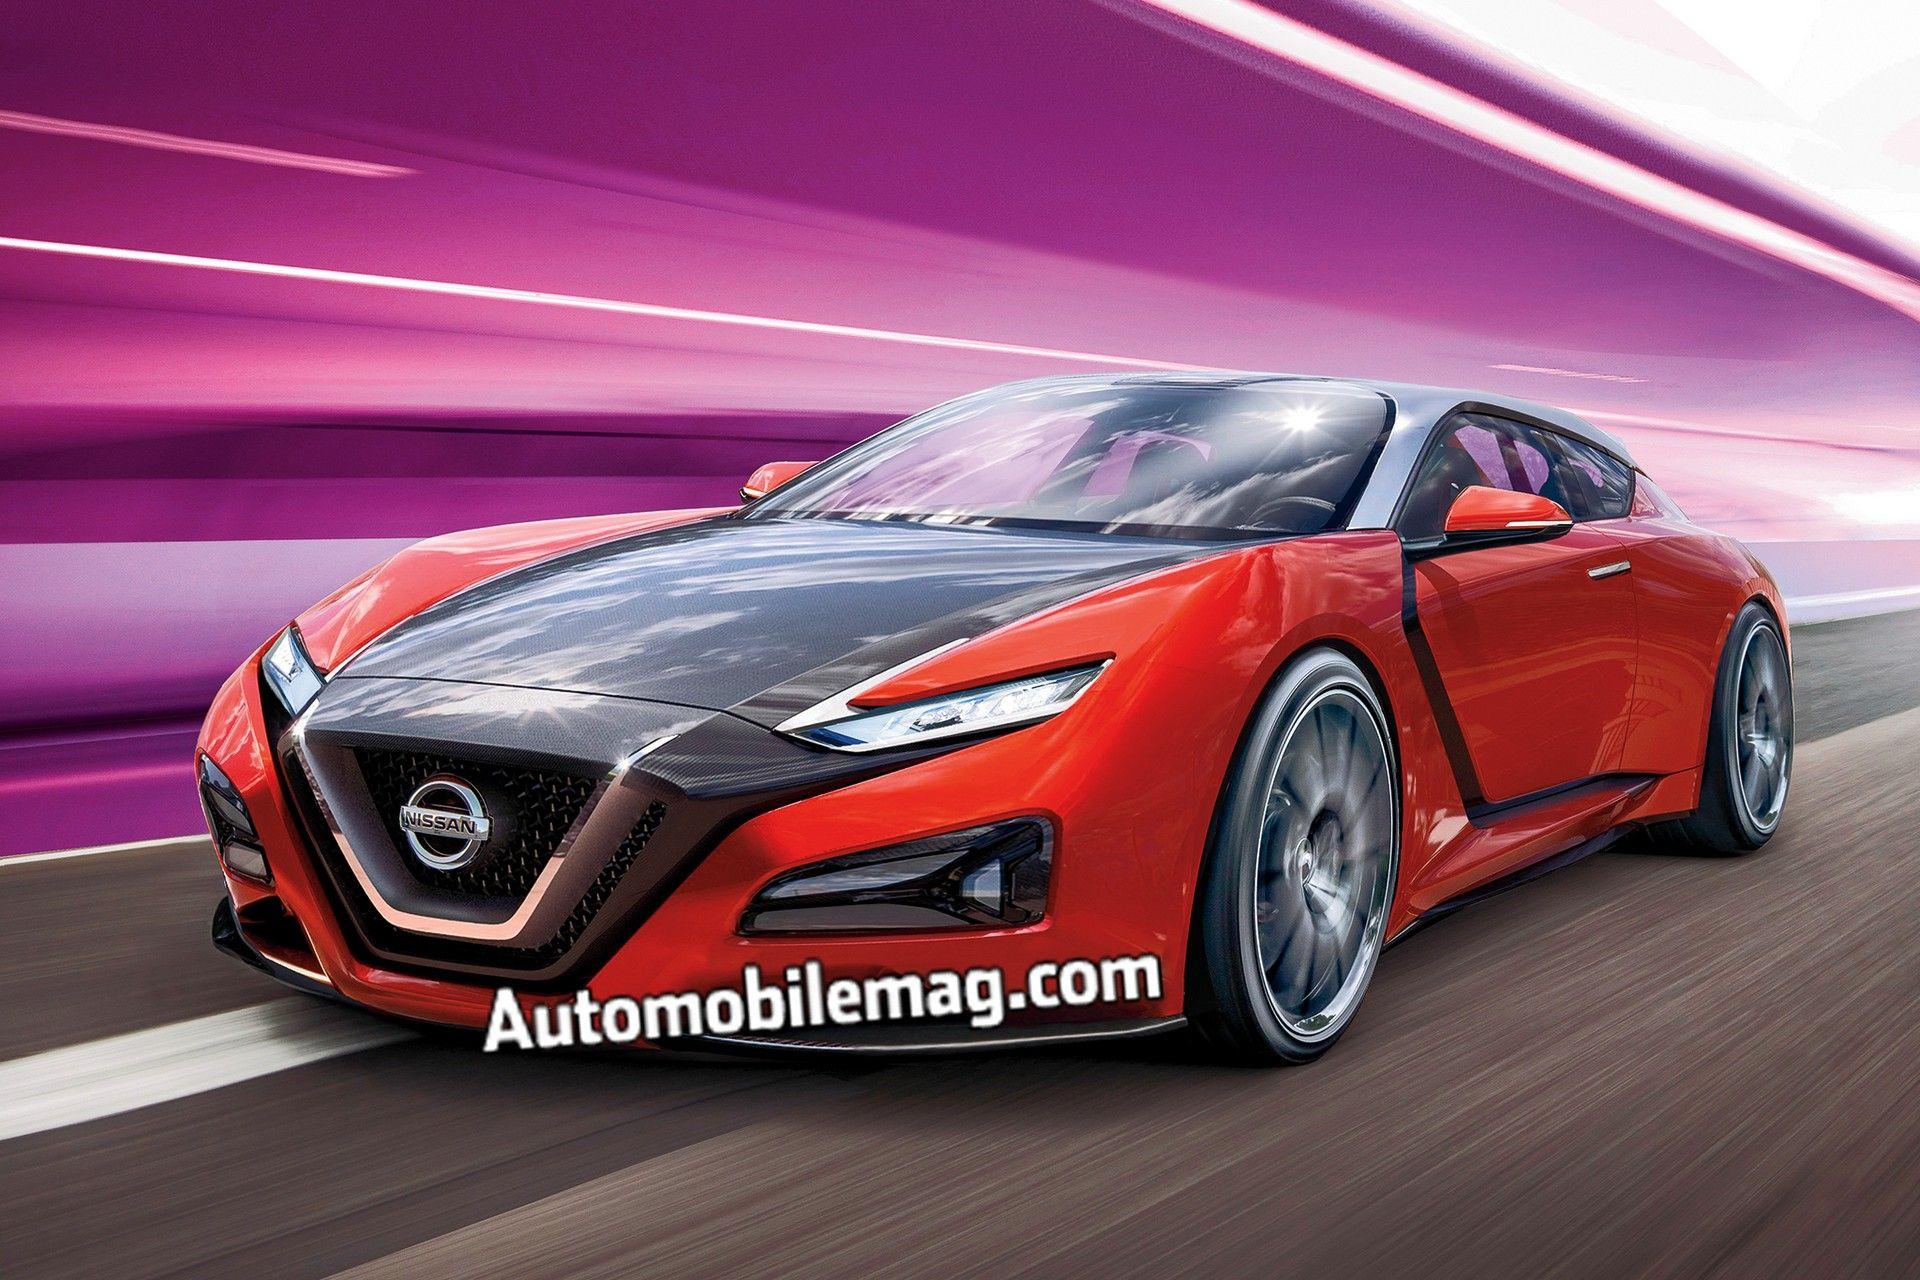 2020 Nissan Z render